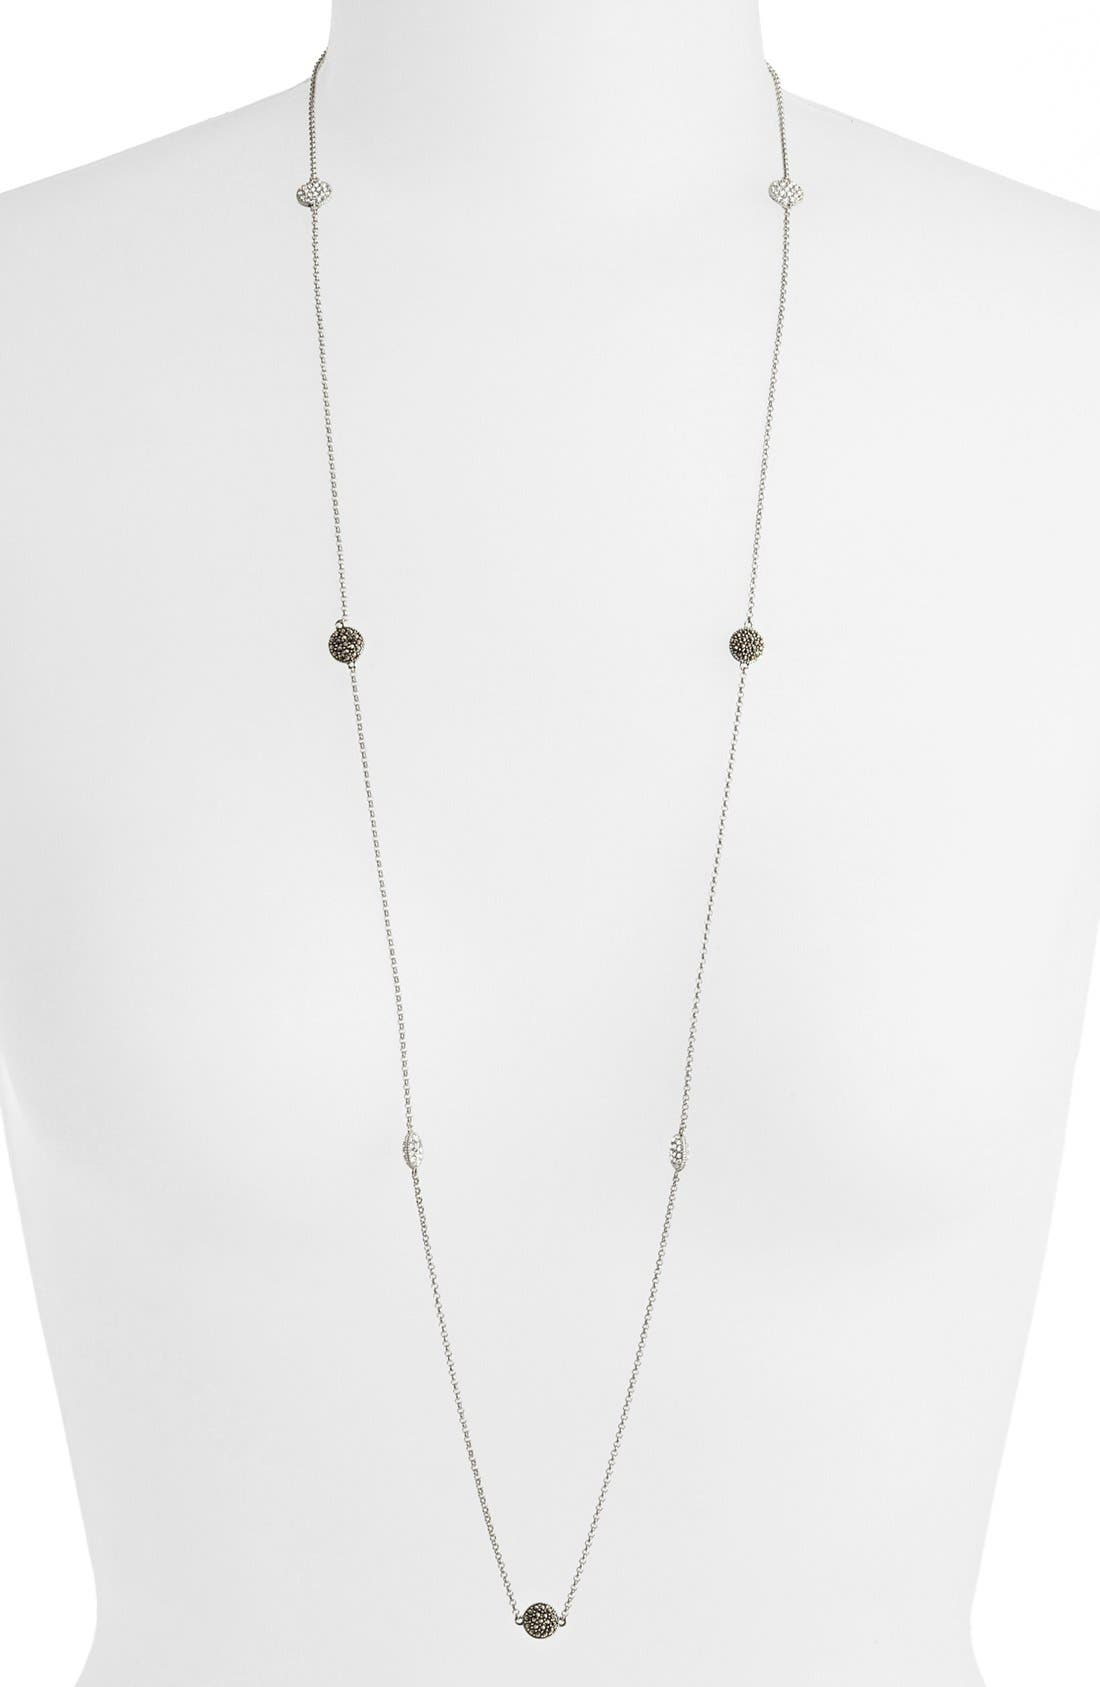 Main Image - Judith Jack Long Station Necklace